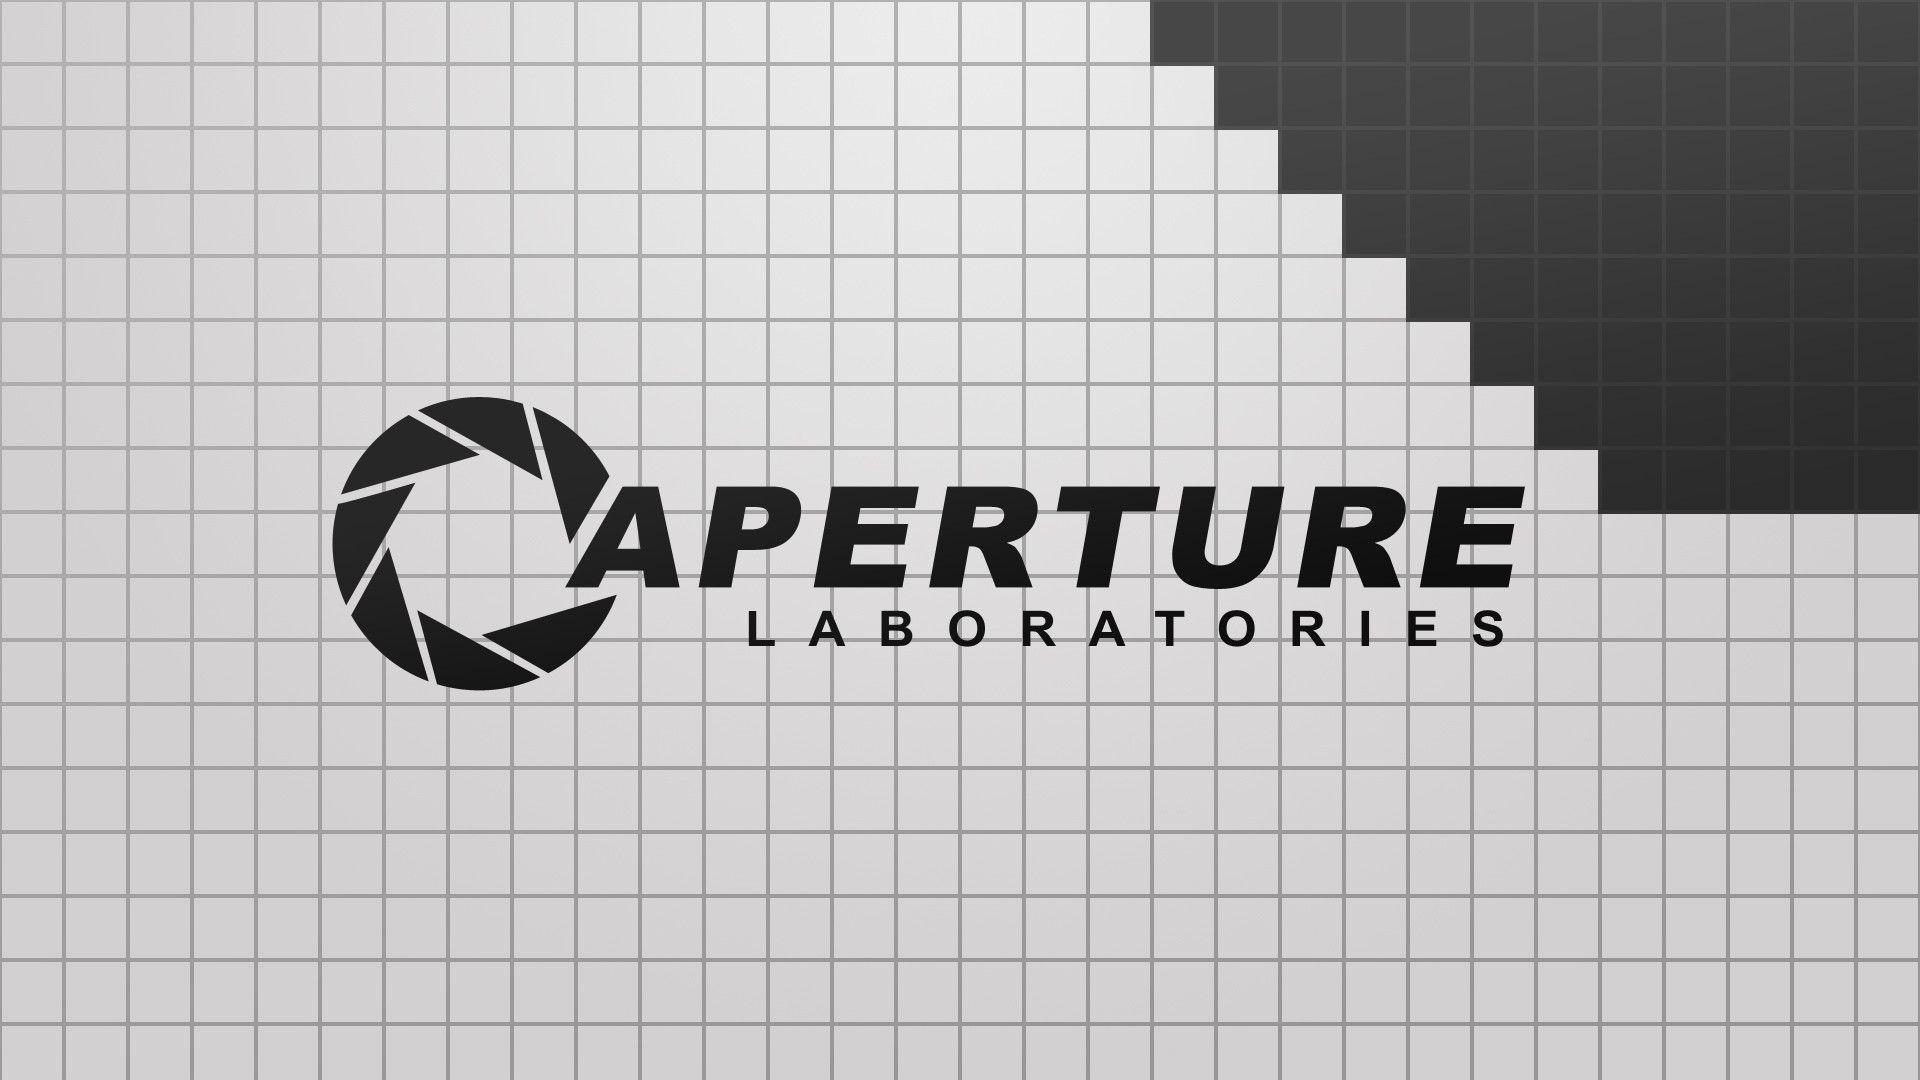 aperture laboratories wallpaper ·①